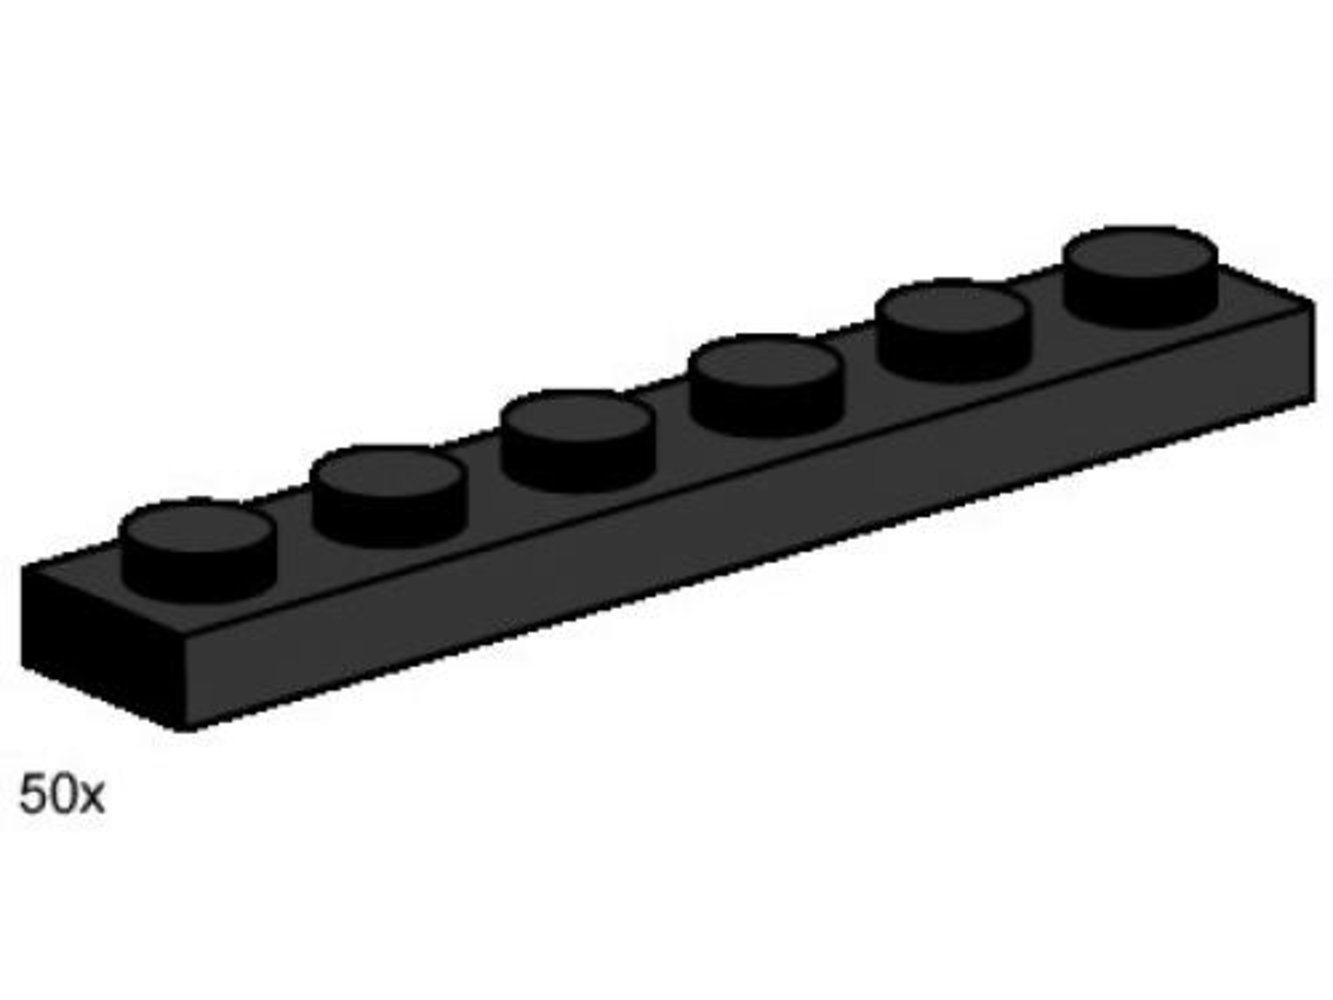 1 x 6 Black Plates